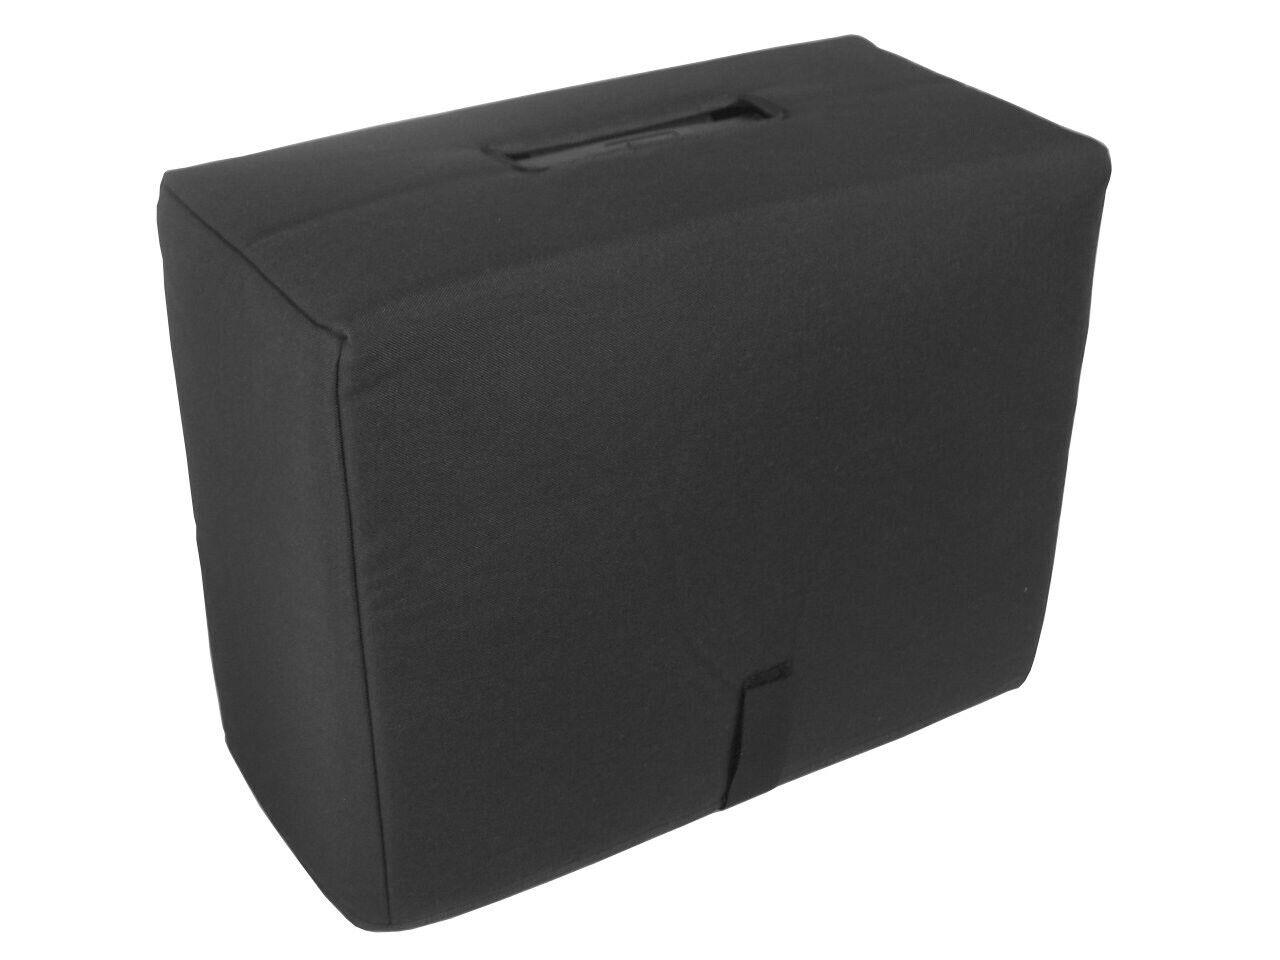 Goodsell Super 17 2x10 Combo Amp Cover - schwarz, Water Resistant, Tuki (good002p)